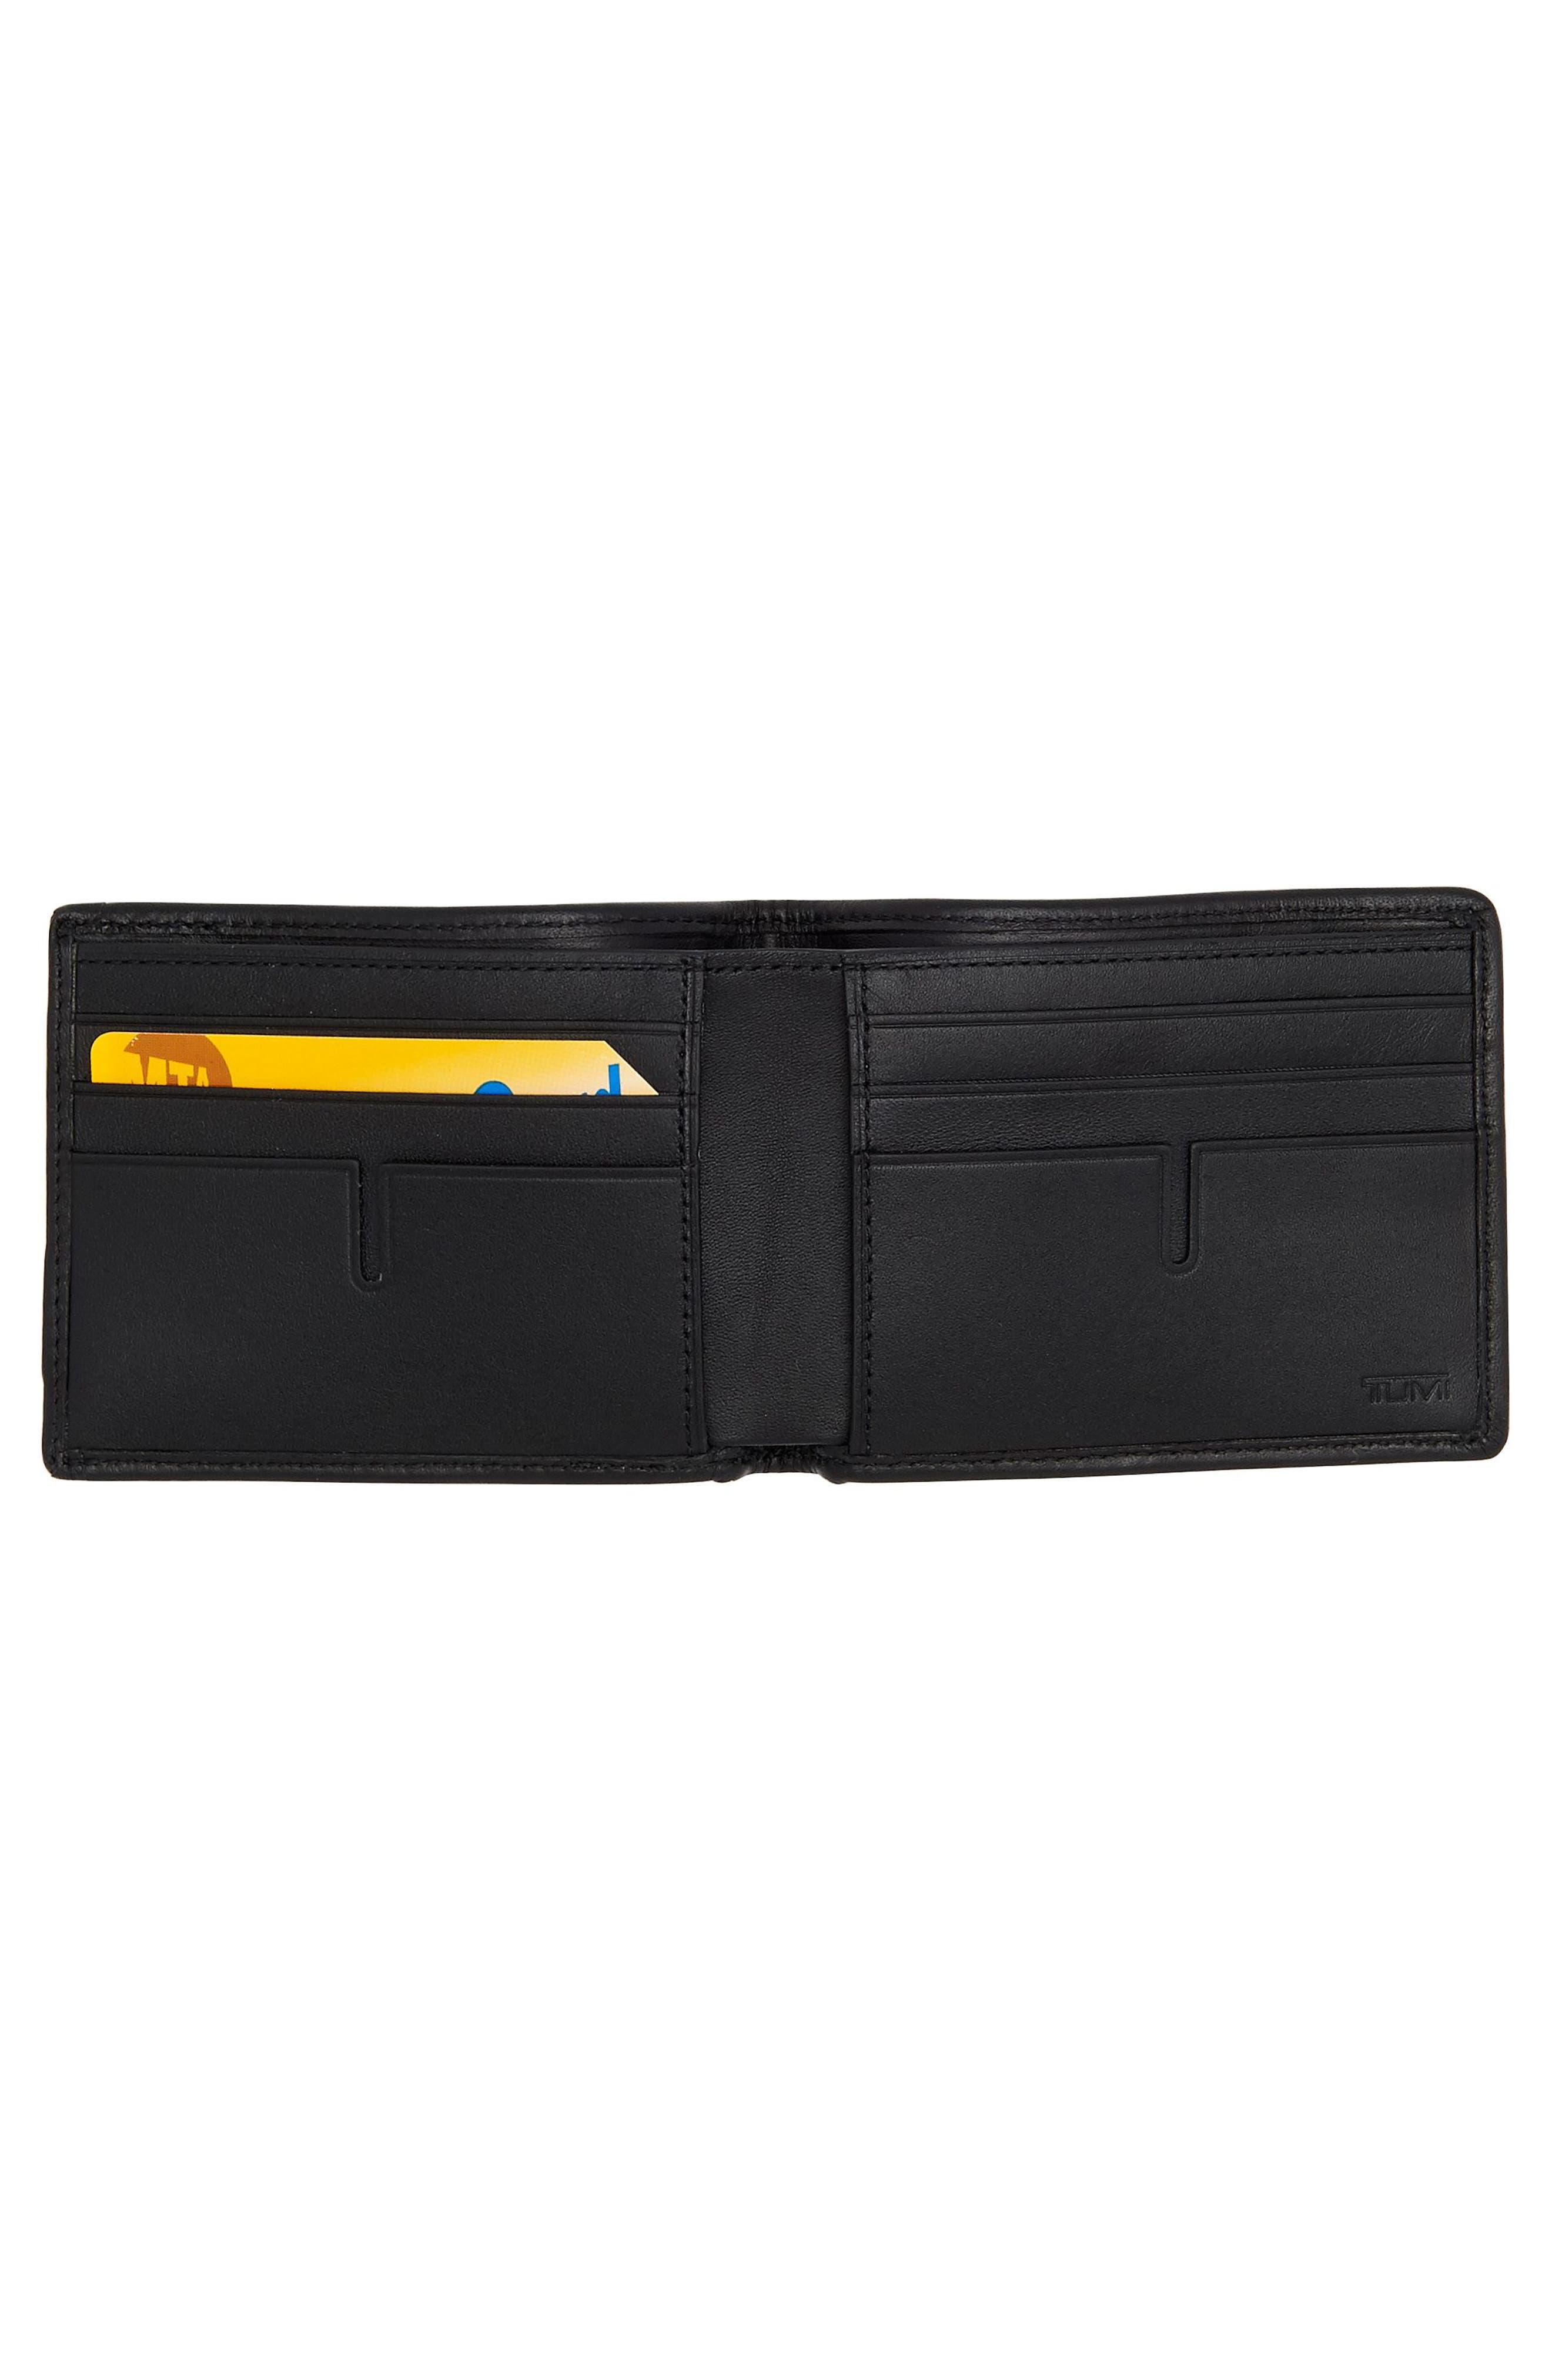 Alpha Billfold Wallet,                             Alternate thumbnail 2, color,                             Anthracite/ Black